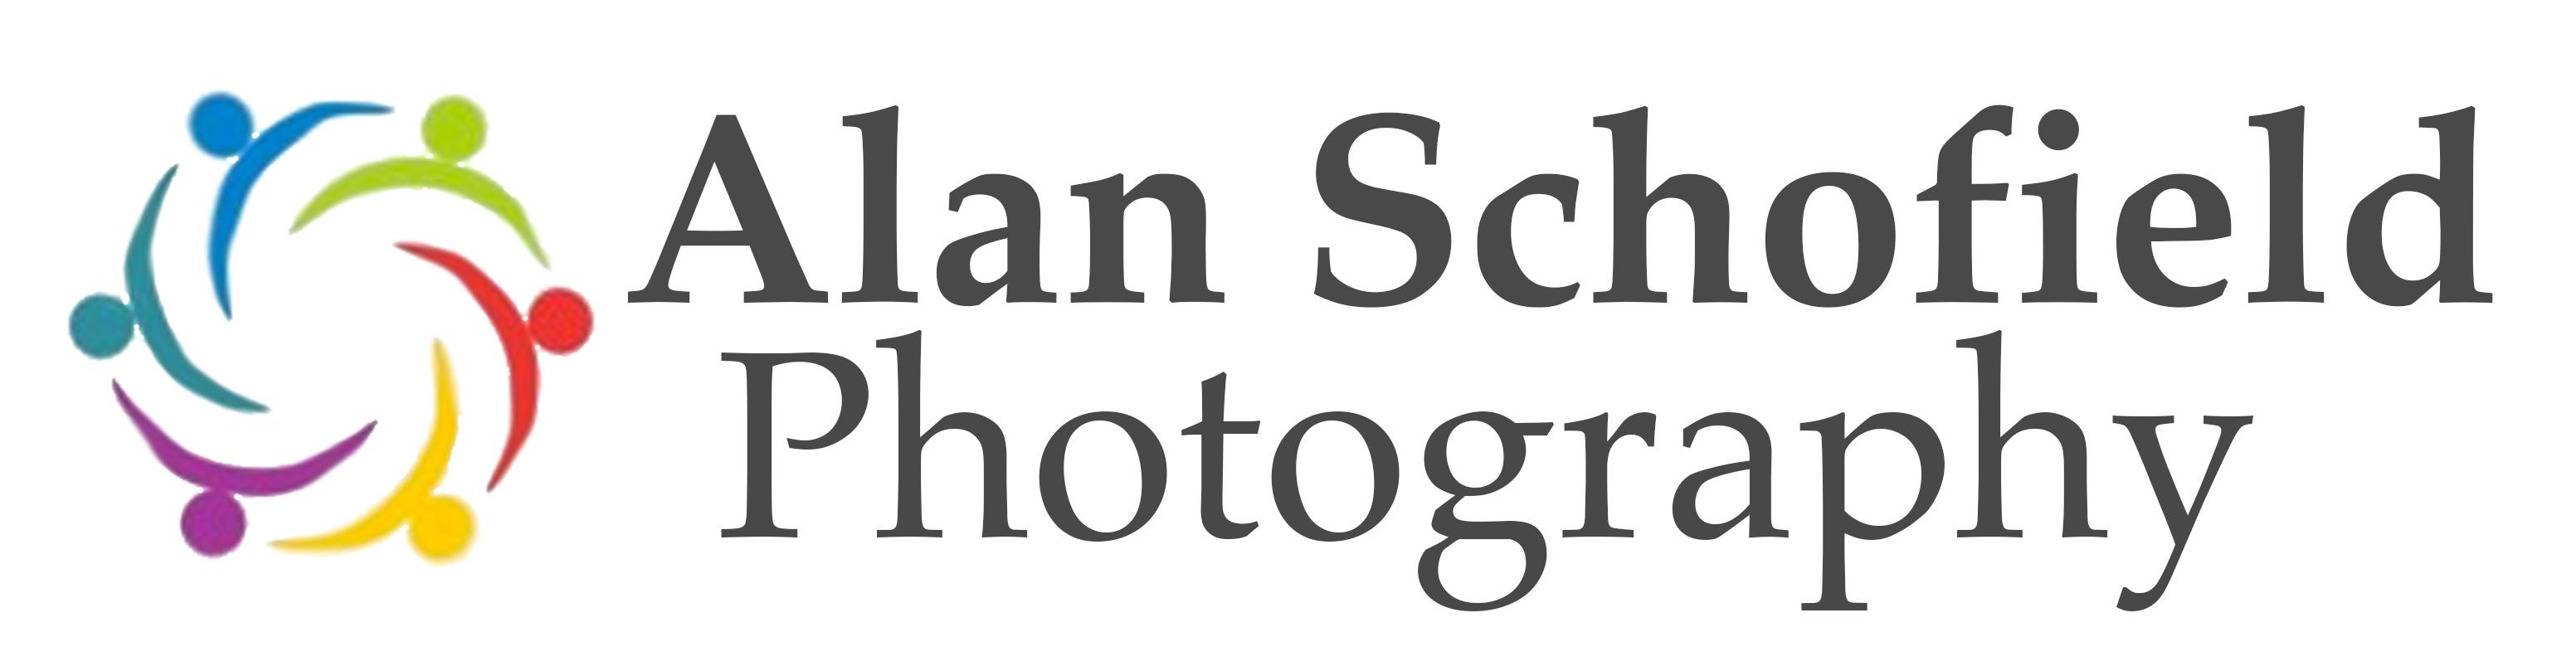 www.alanschofieldphotography.co.uk